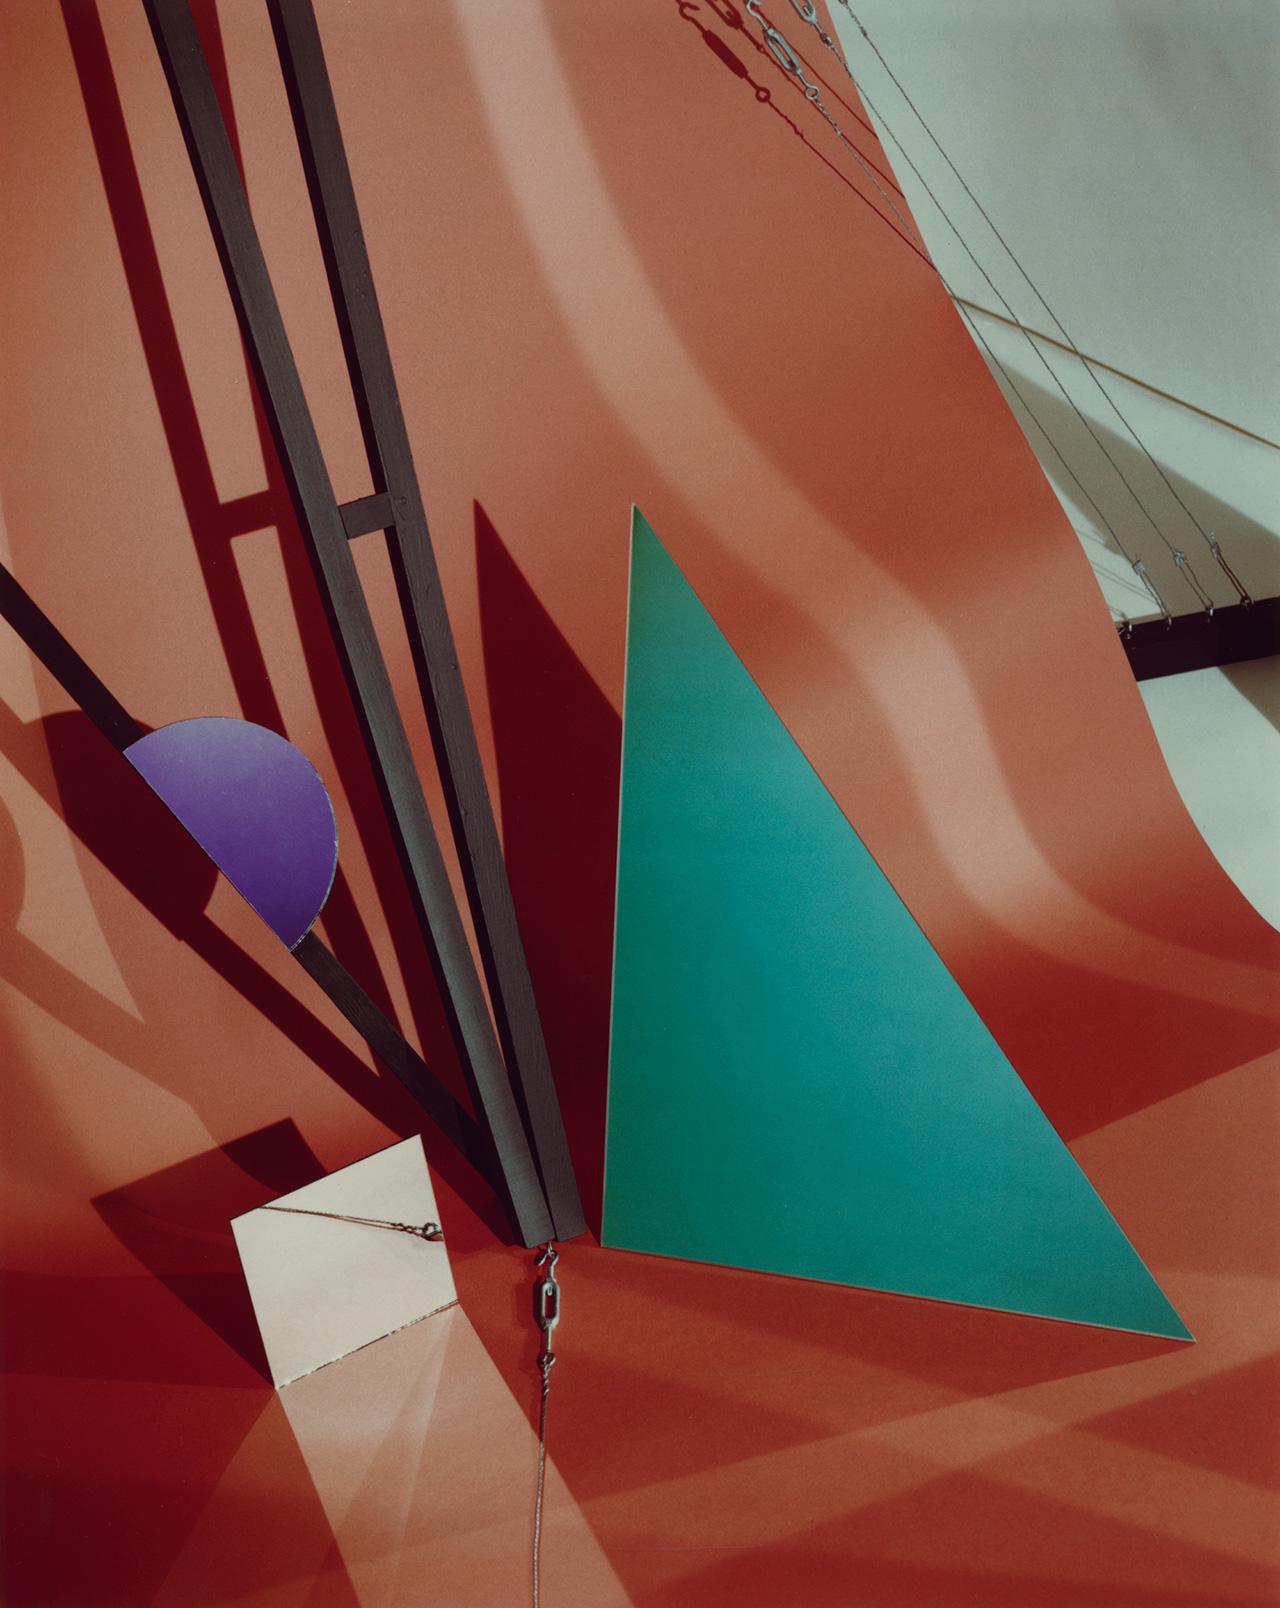 "Barbara Kasten, ""Construct VIII"" (1982), Polaroid, 10 x 8 in. (courtesy of the artist)"